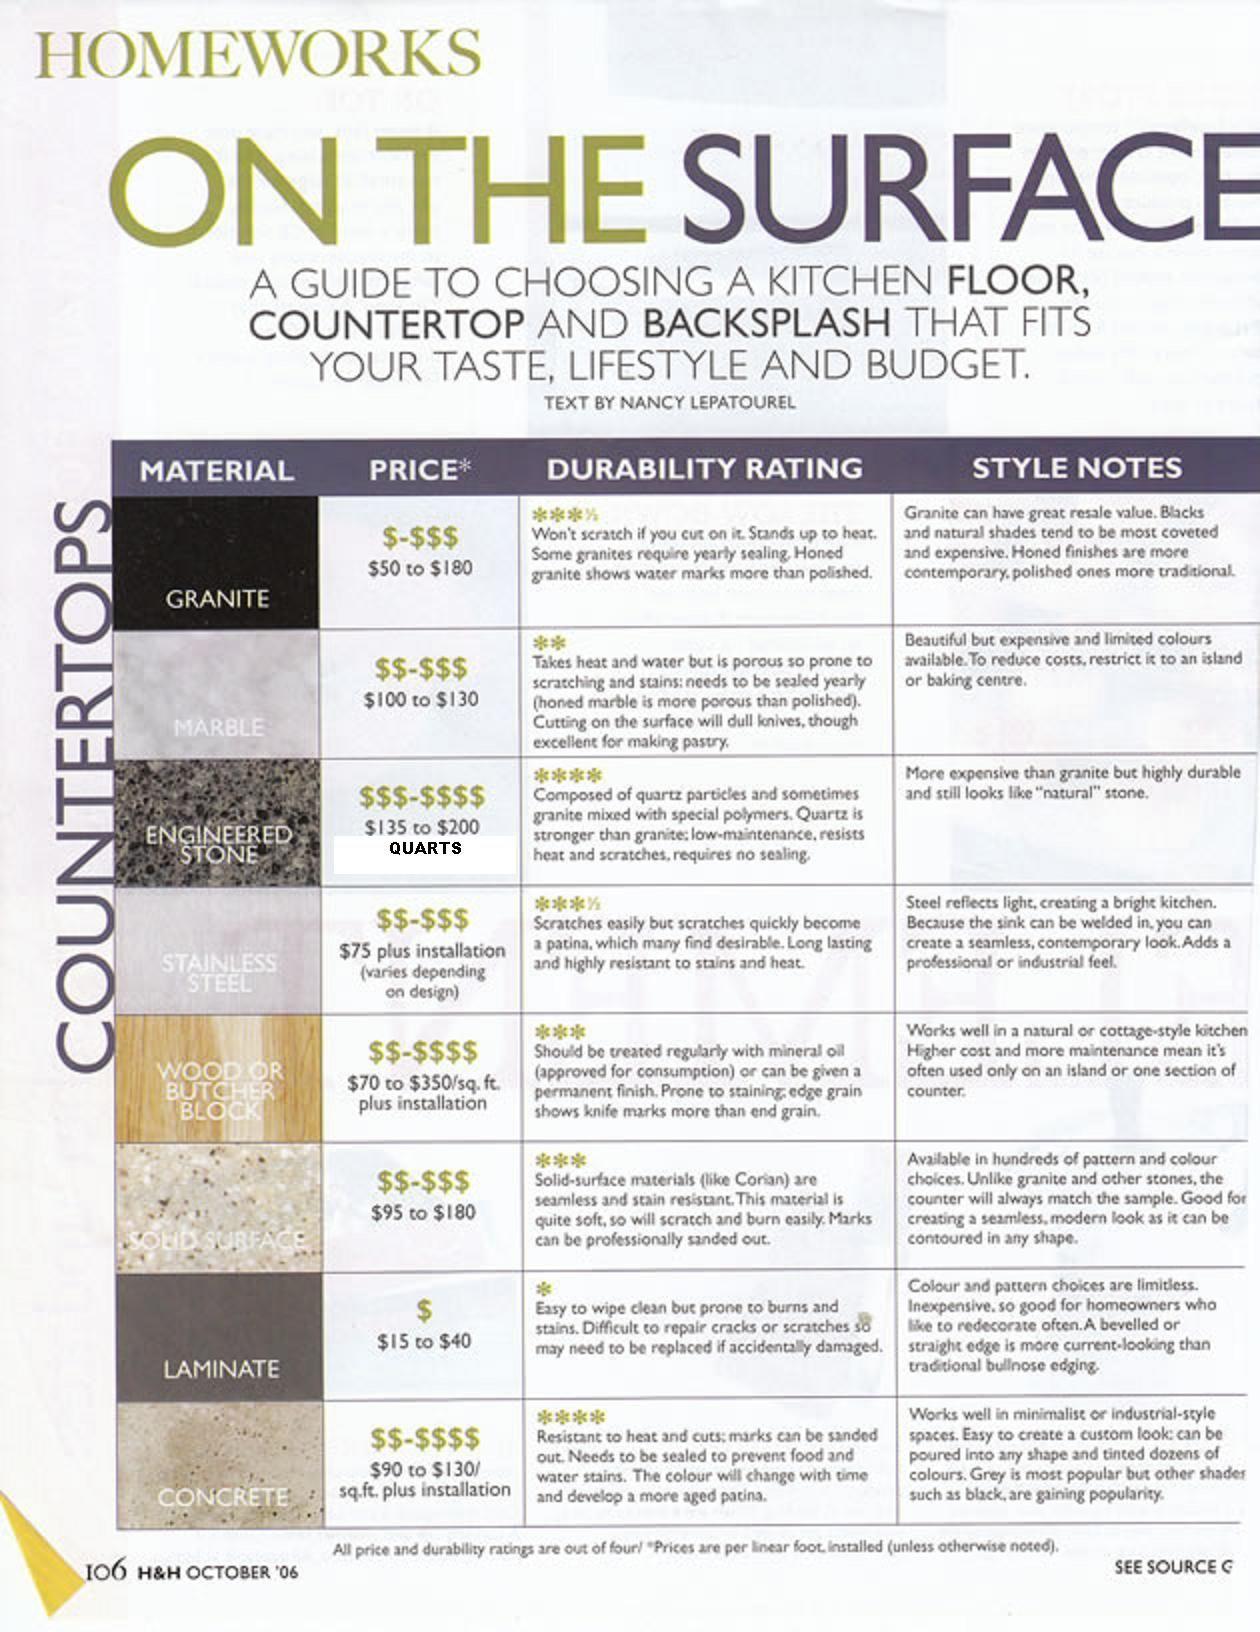 Countertops: Stainless steel, quartz, Corian and laminates